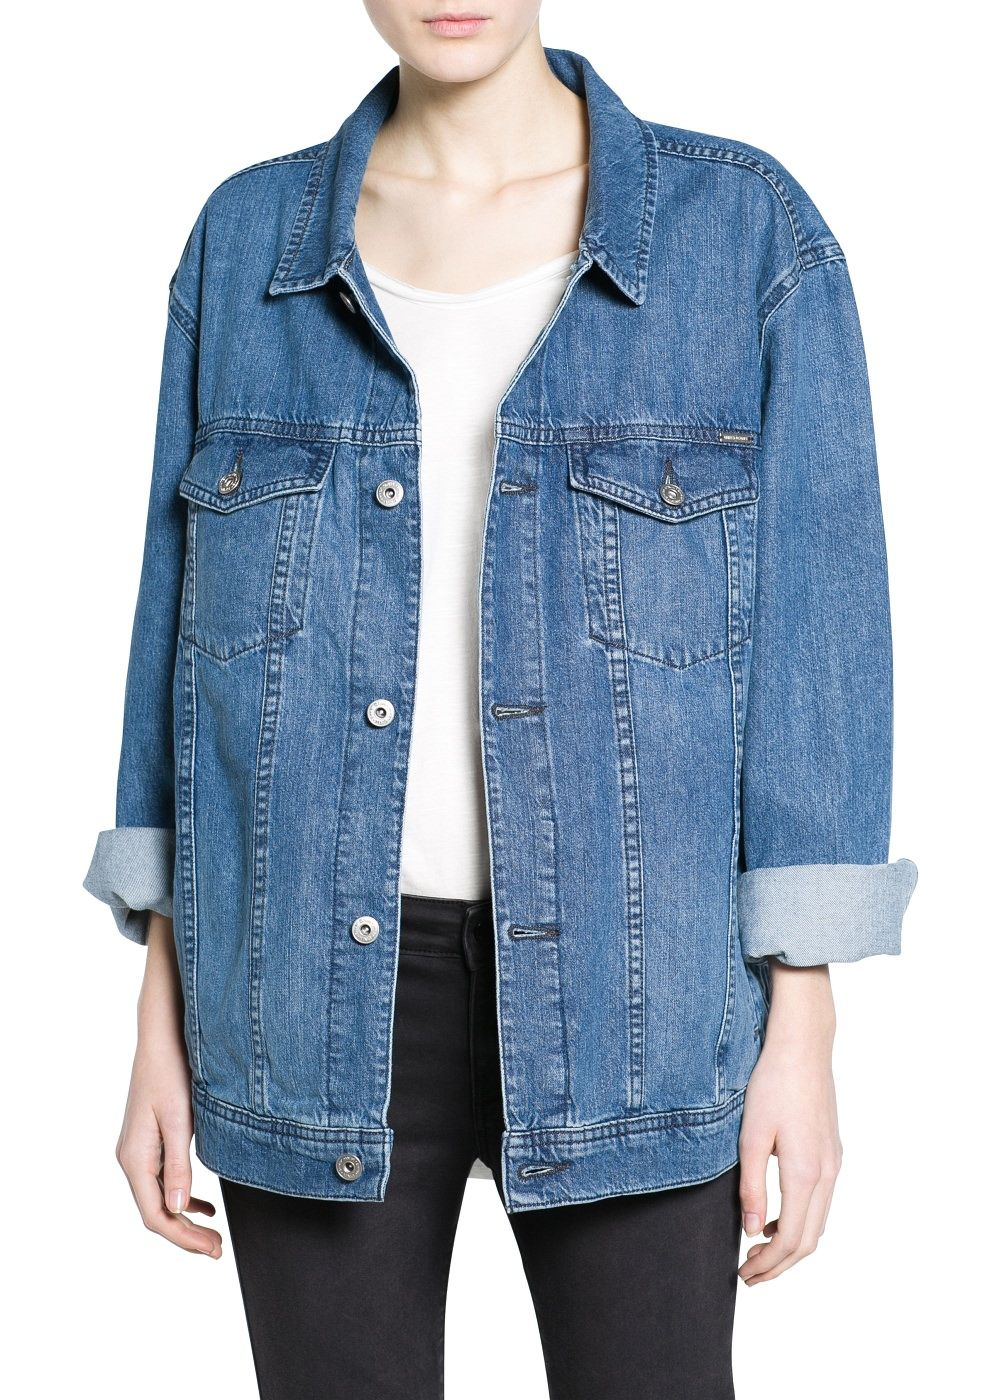 How to Wear an Oversize Denim Jacket | Oversized denim jacket ...